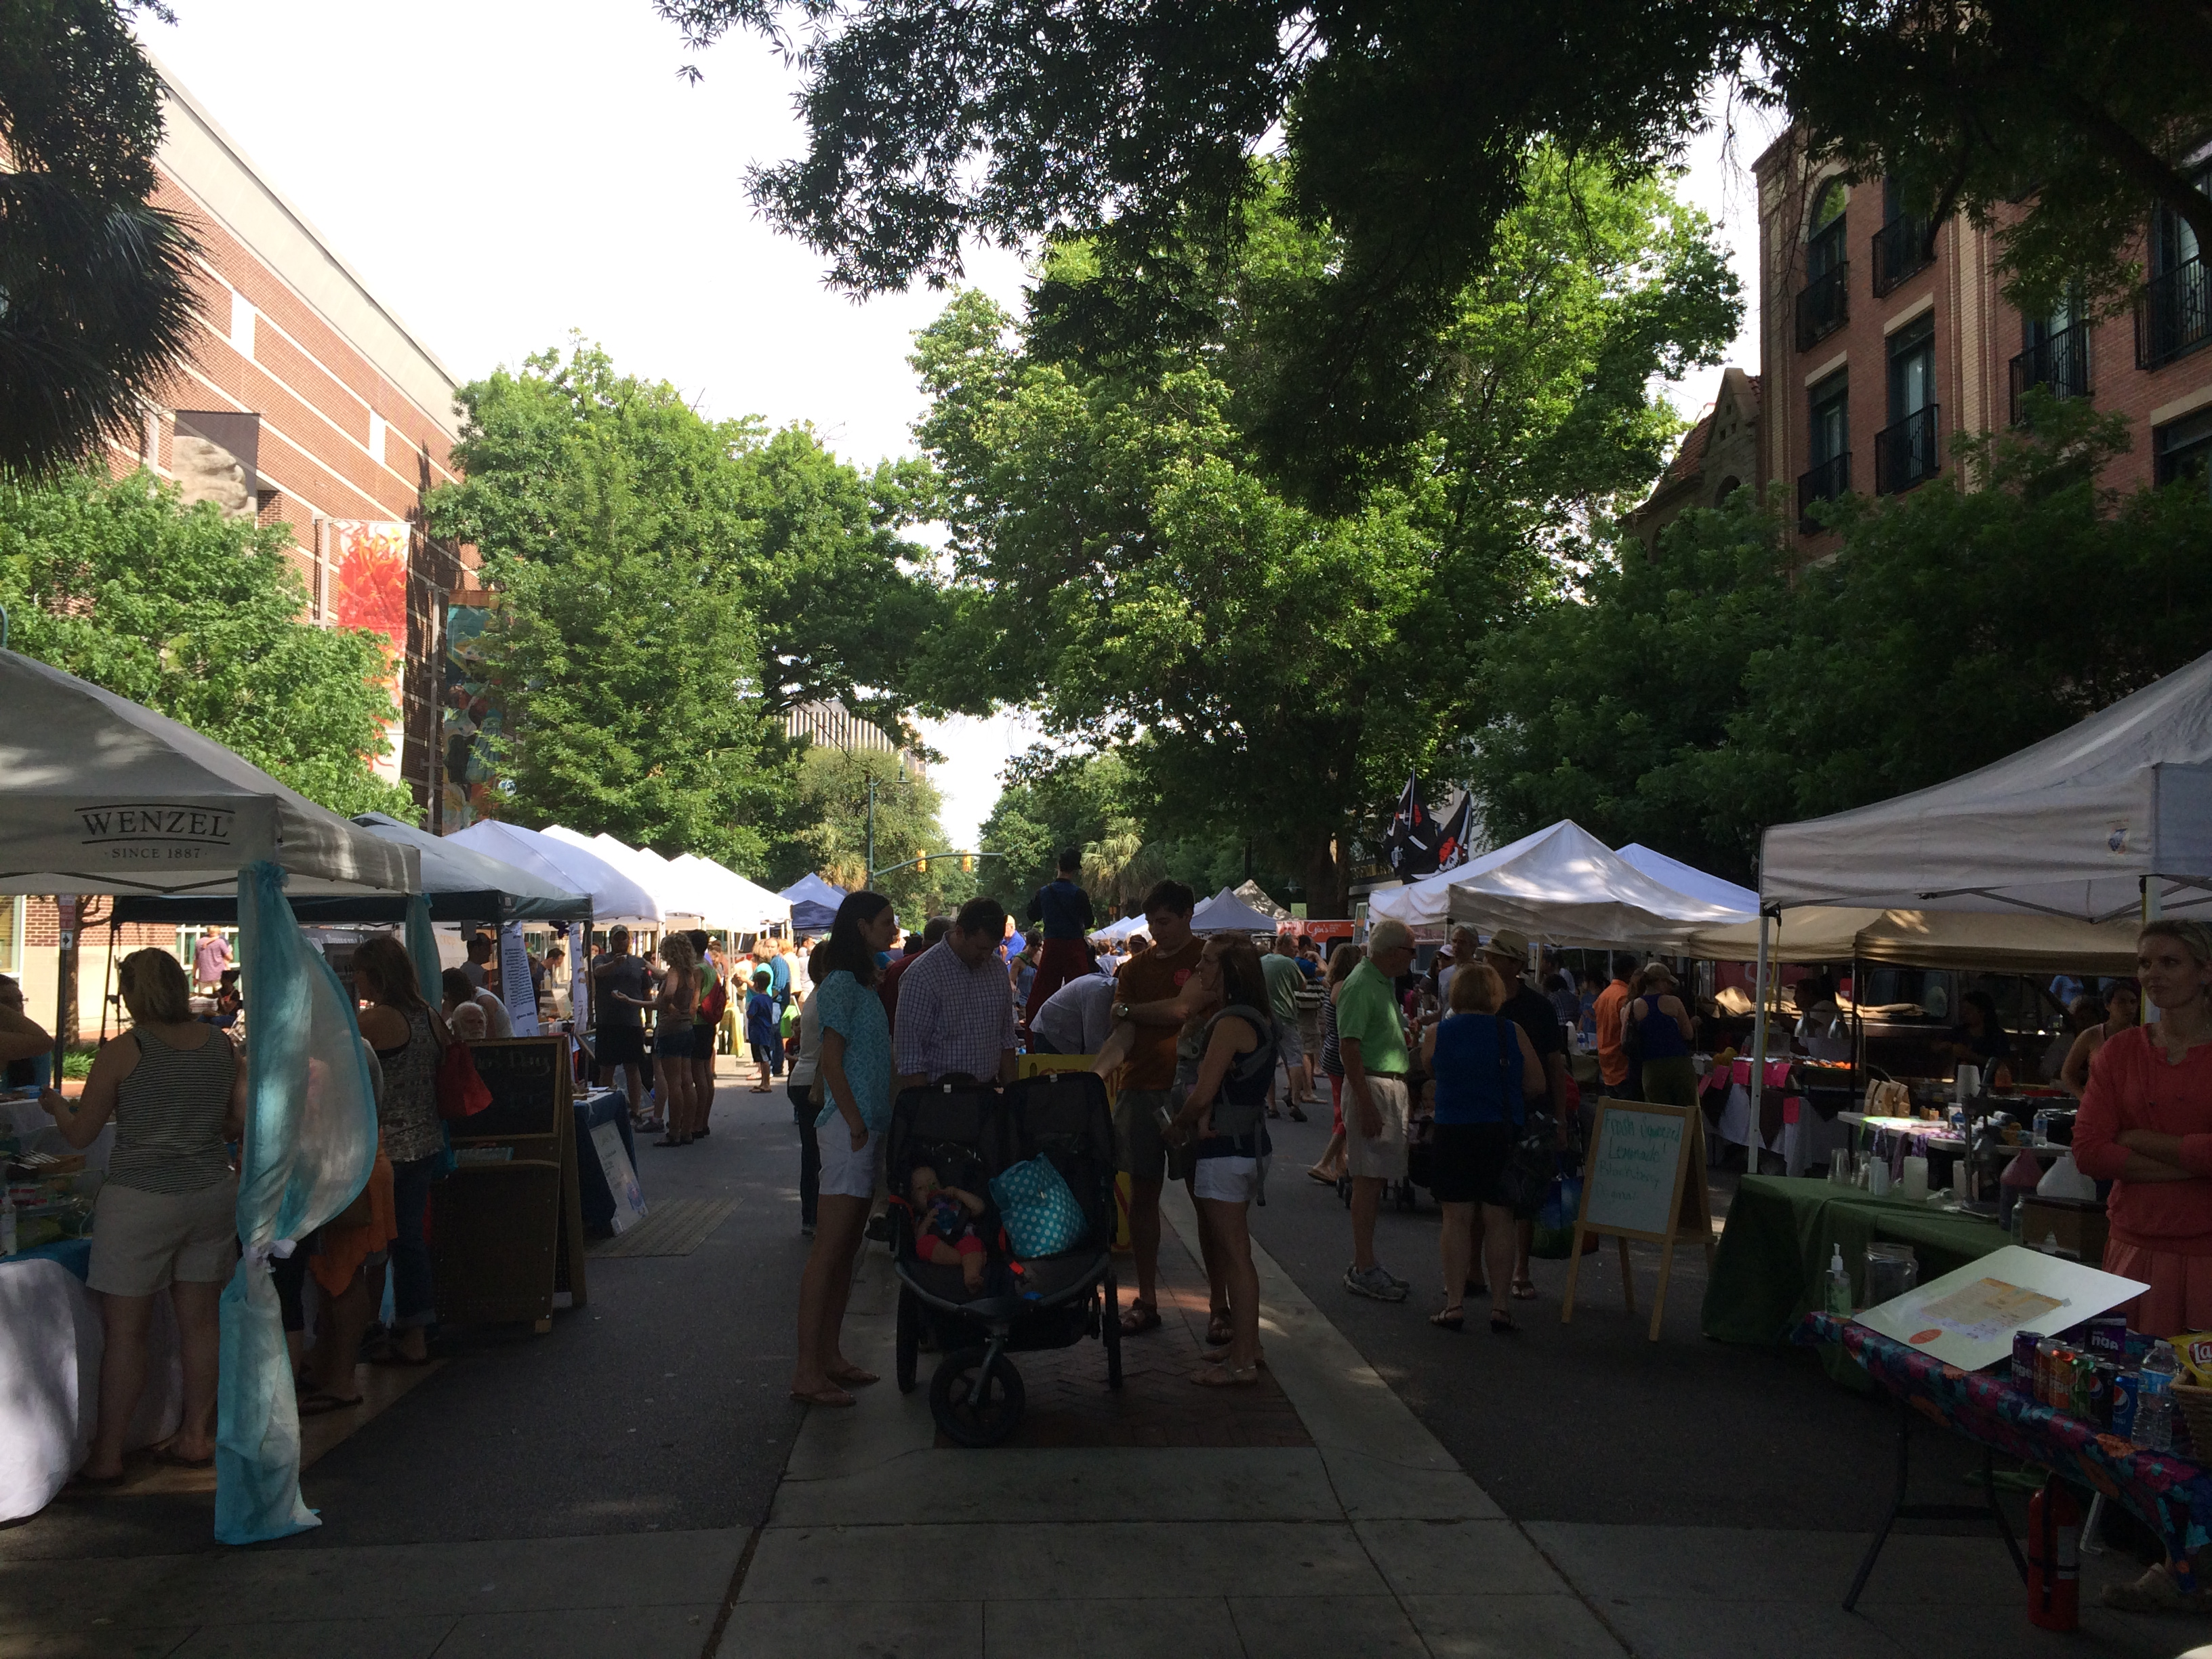 Soda City Market on Main Street in downtown Columbia, SC